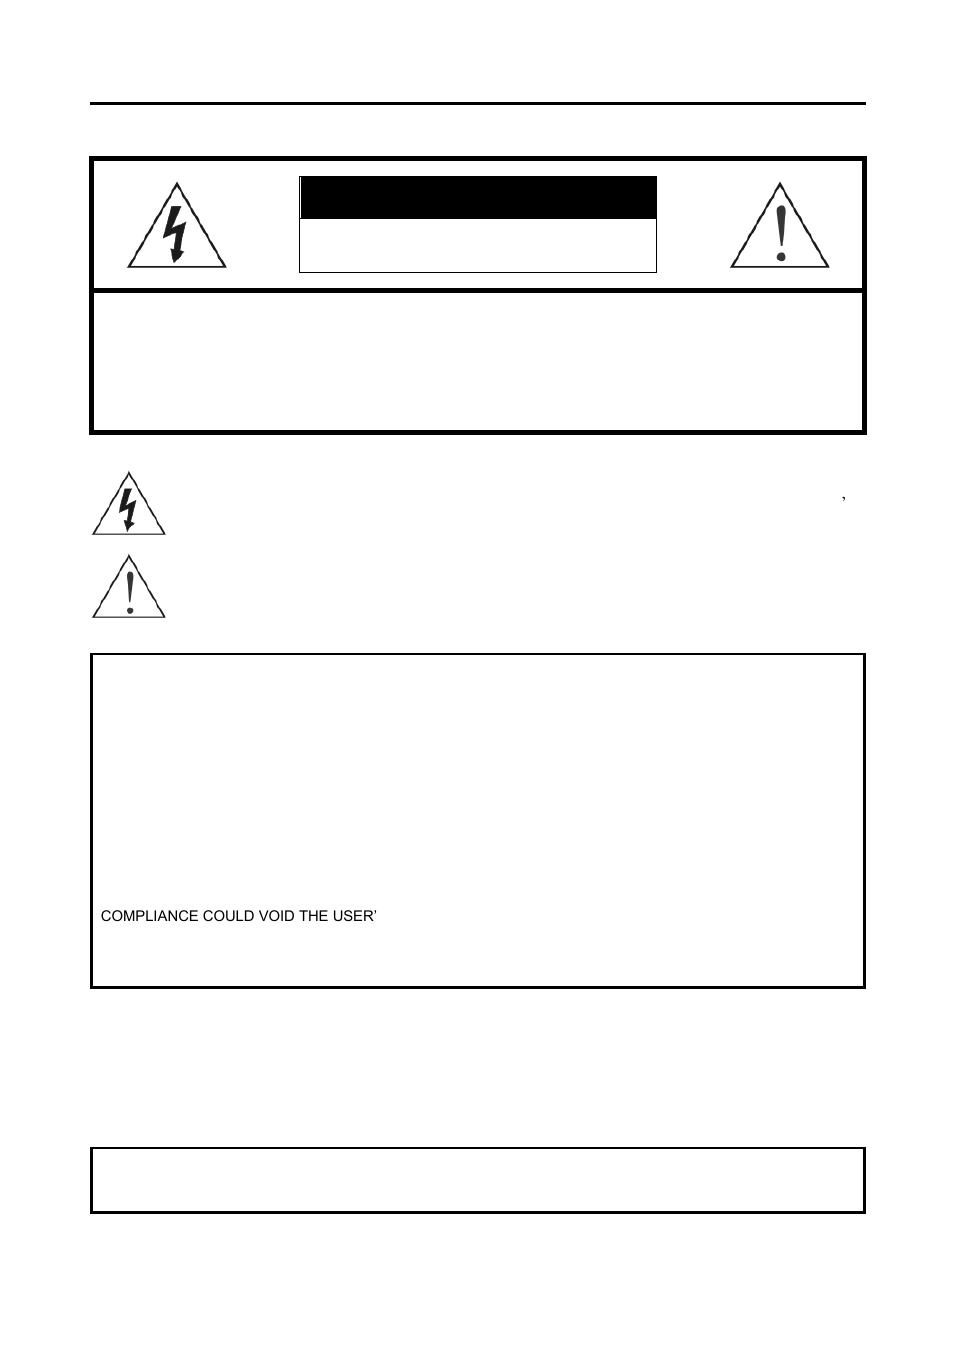 warning compliance notice of fcc revo r4cmb 500 user manual rh manualsdir com Revo III Adj Revo 3